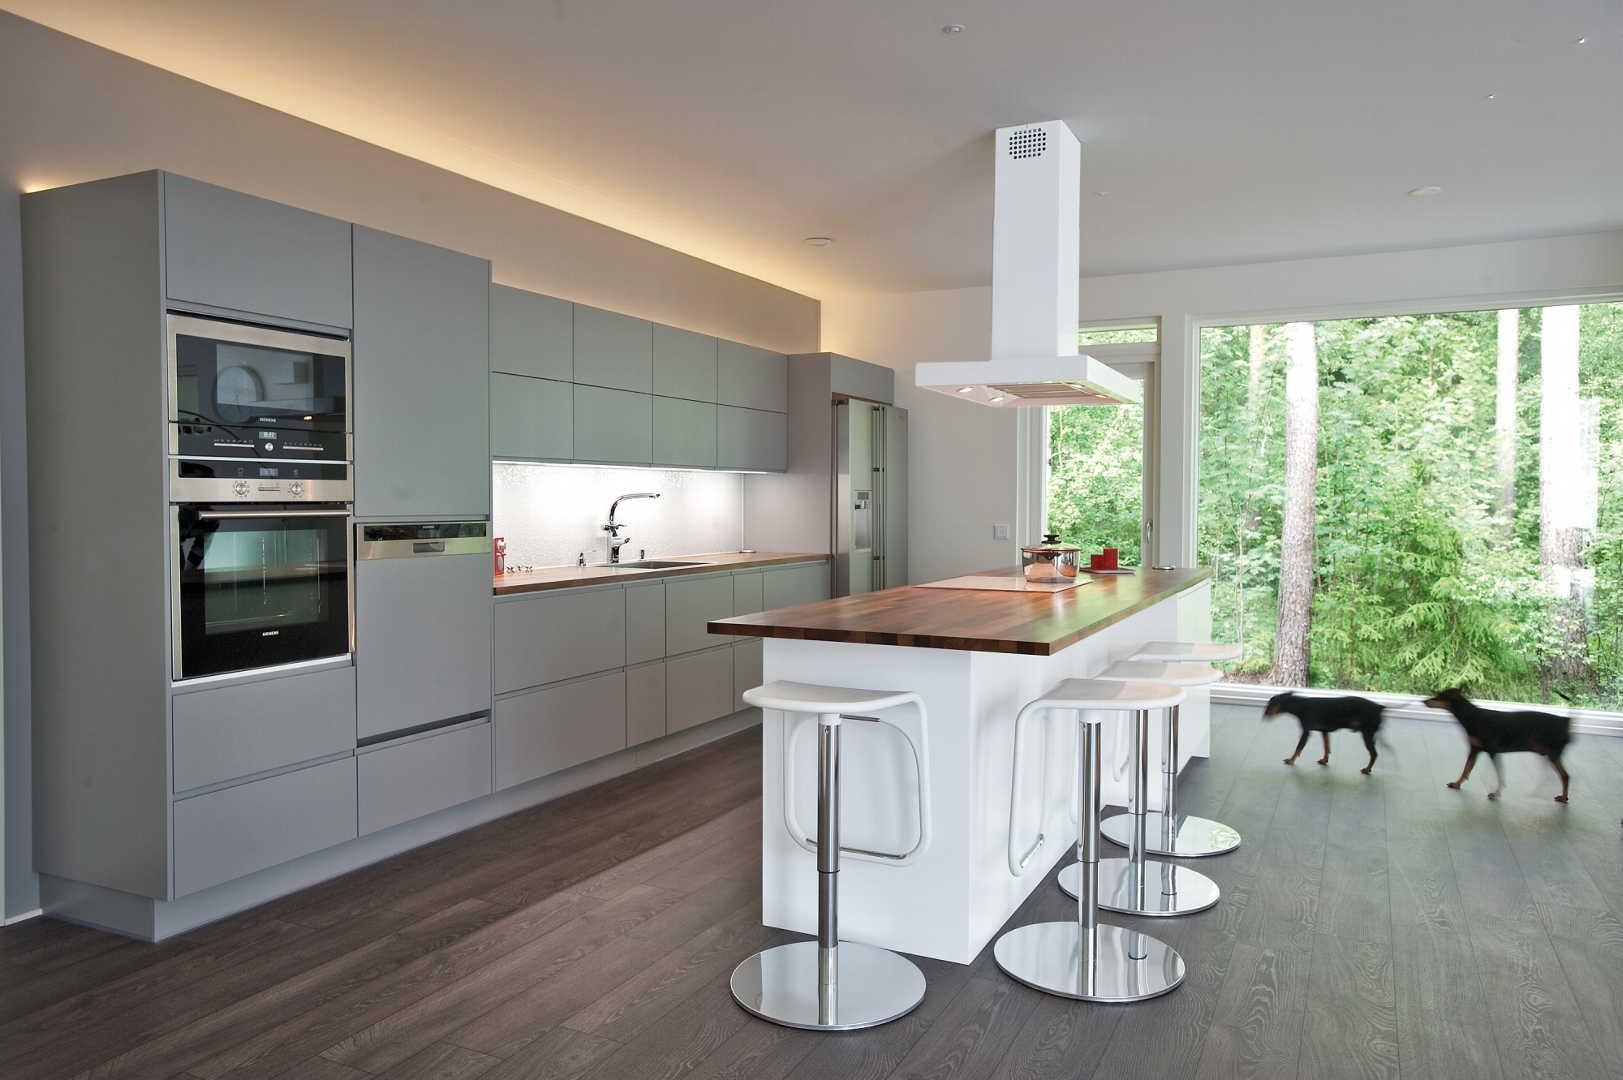 Moderni keittiö, Sisustus  keittiö, Gloria keittiöt, 52973f51498e5d0348a5ebd